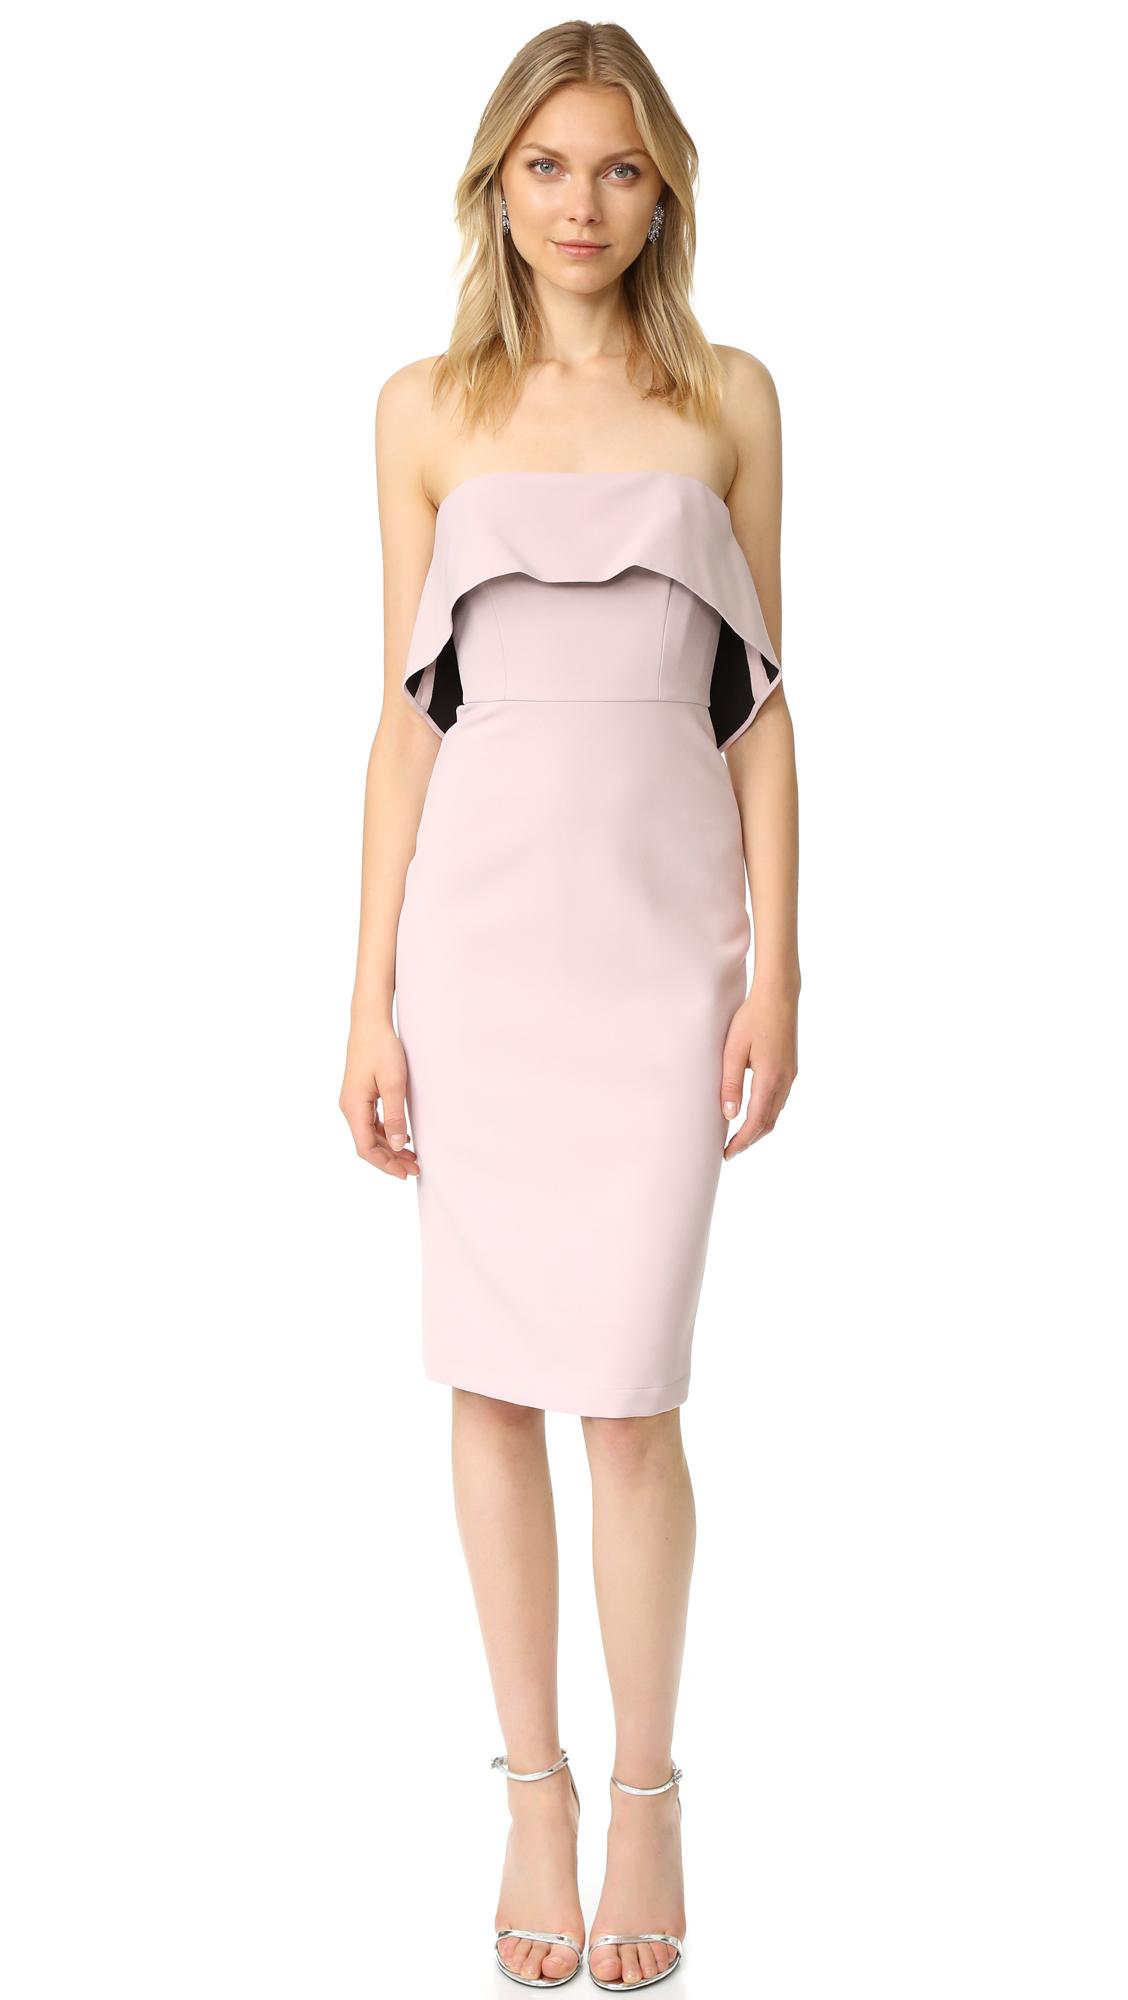 Bcbgmaxazria Strapless Ruffle Dress - Tea Rose at Shopbop